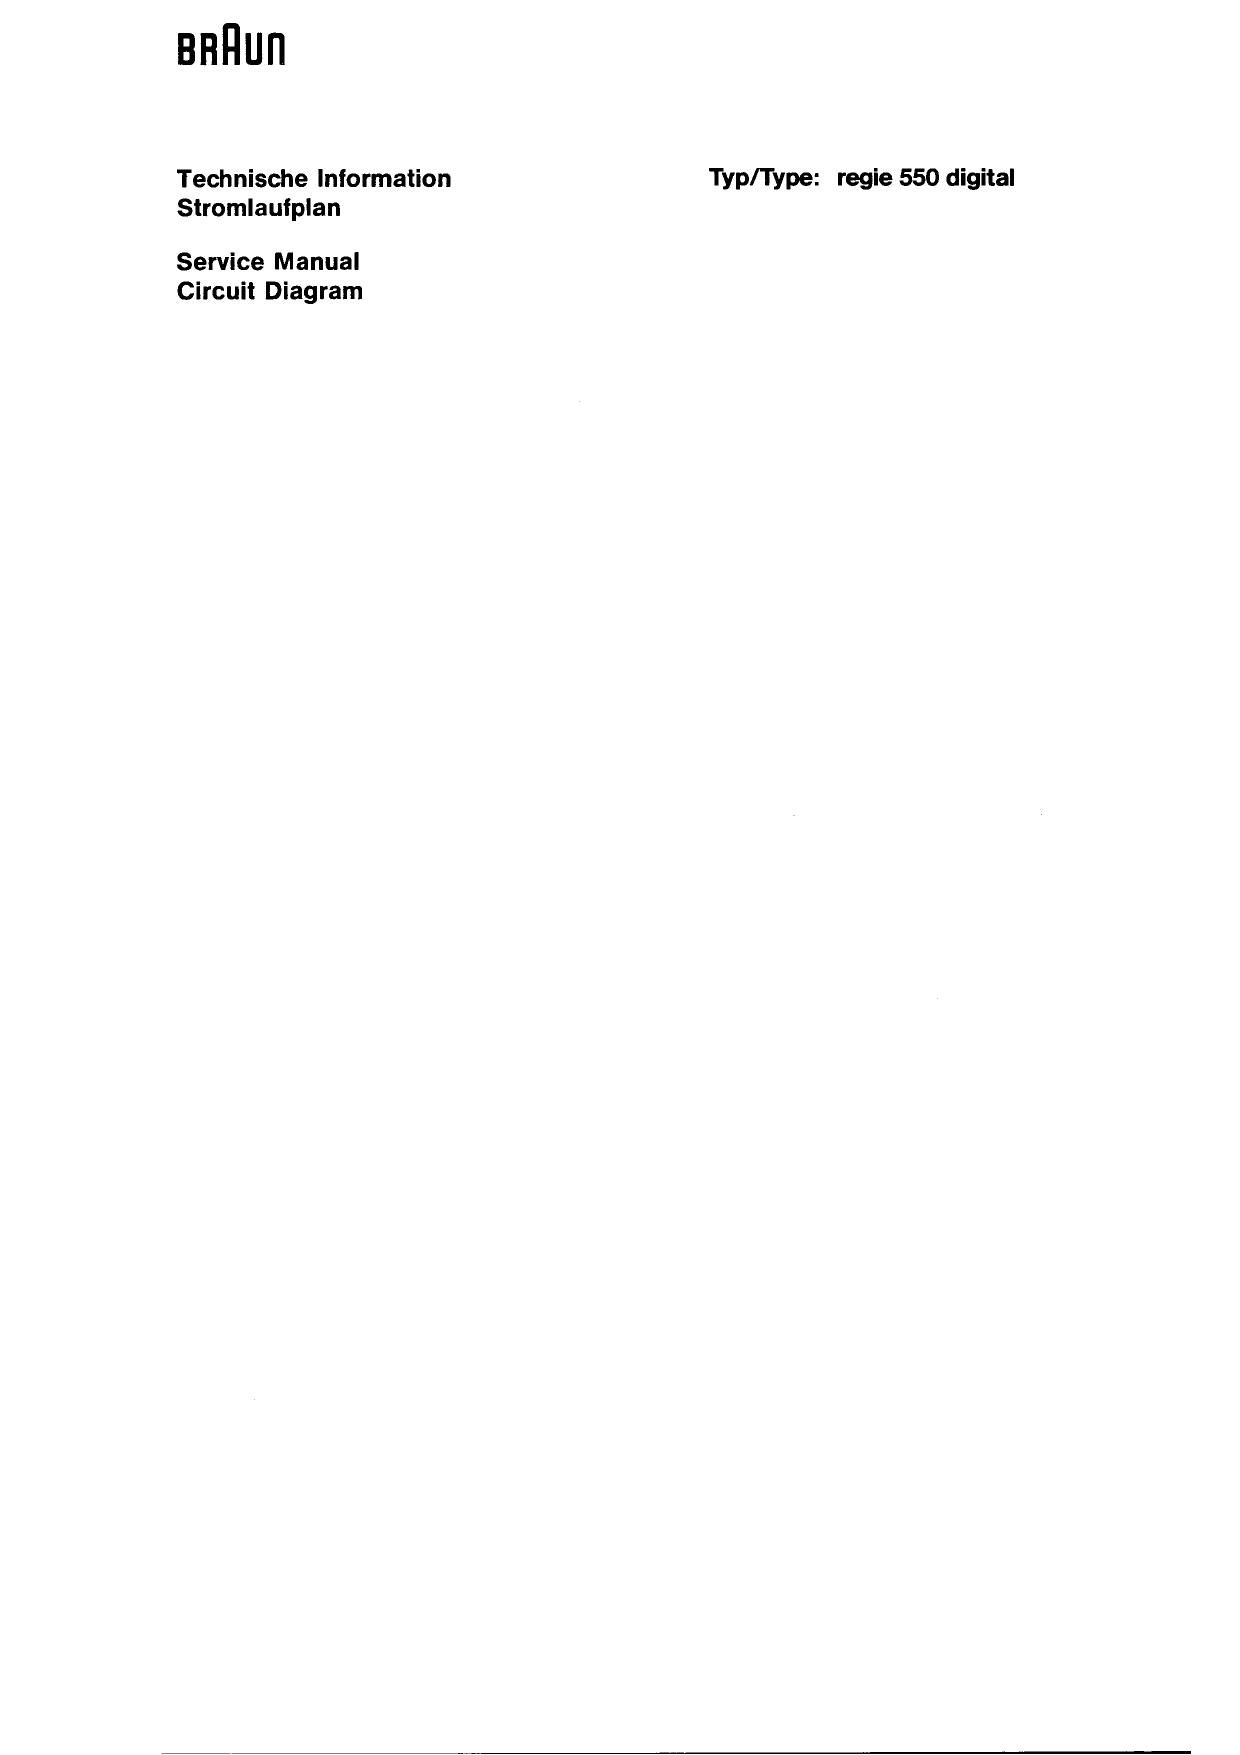 B Braun Manual 2000 Hyundai 15l Fuse Box Diagram Array Regie 550 Service Rh Audioservicemanuals